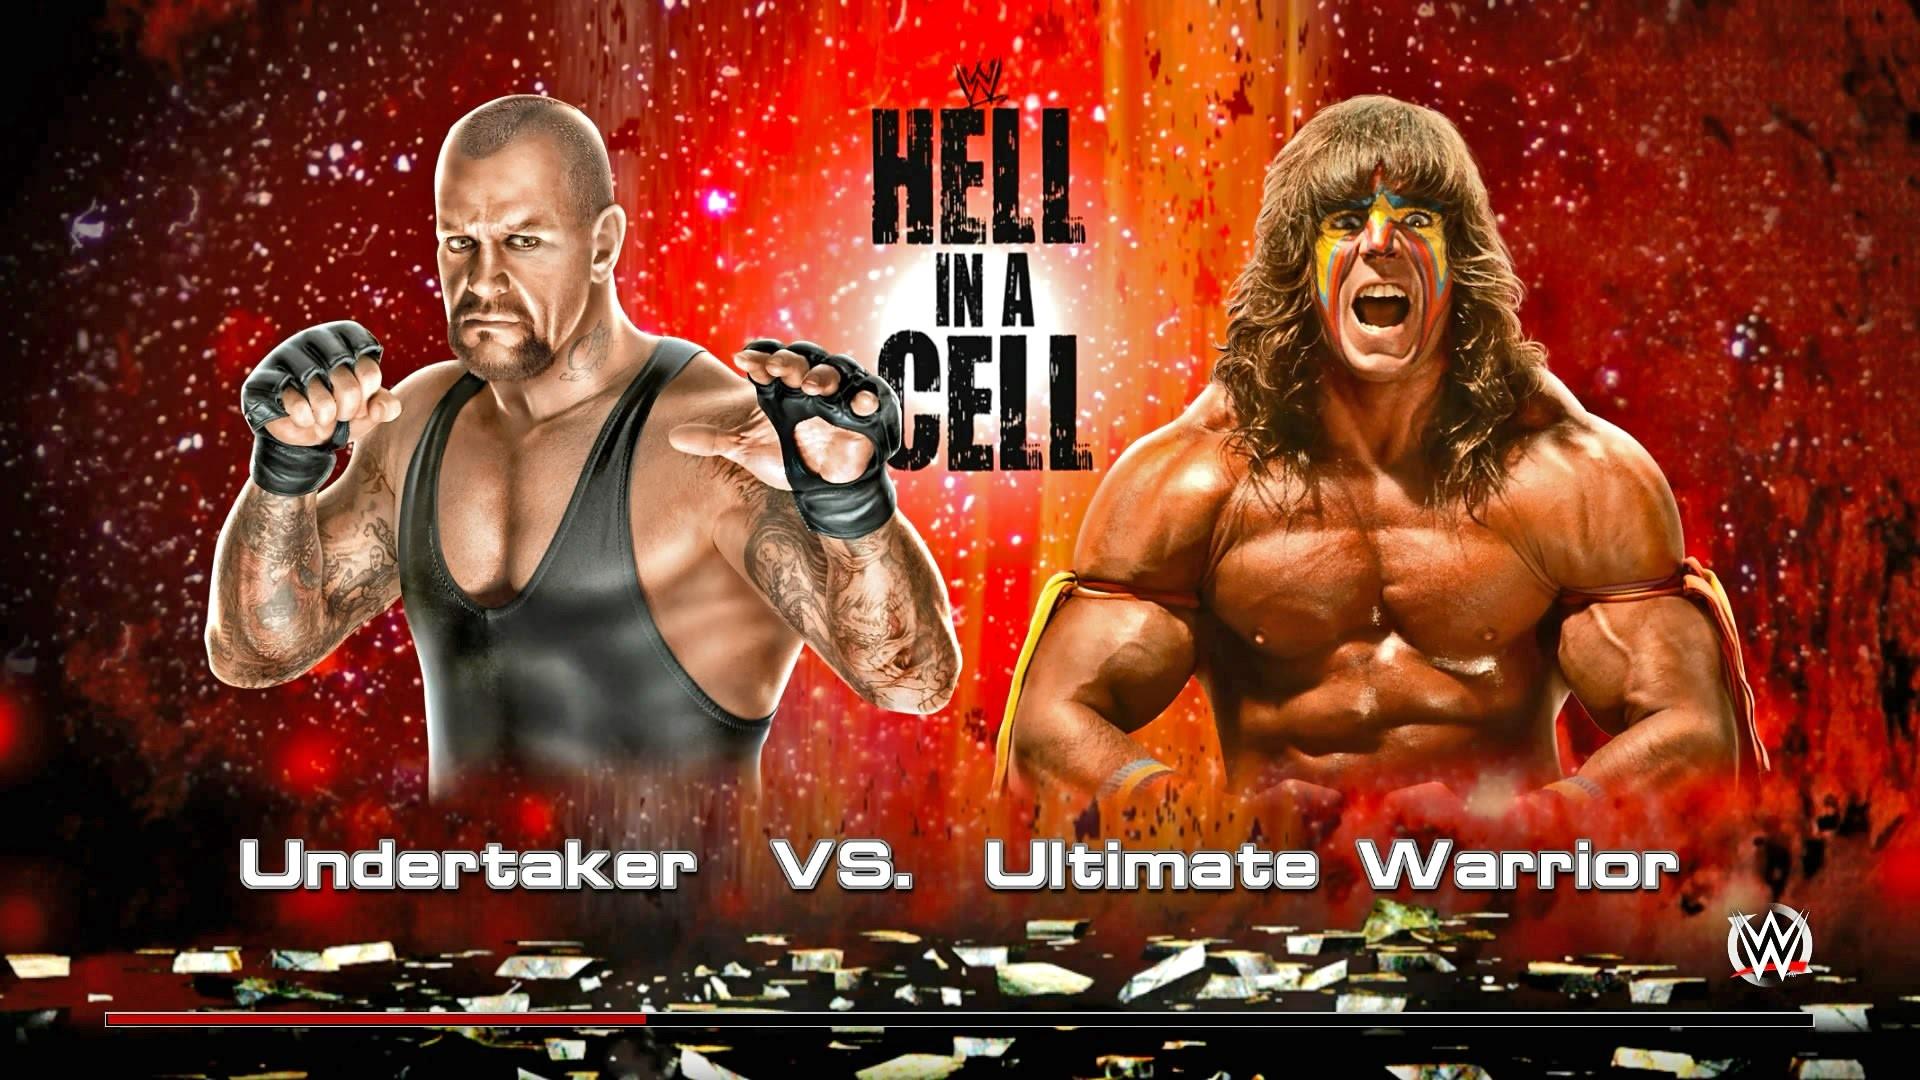 WWE 2k15 – Undertaker vs Ultimate Warrior